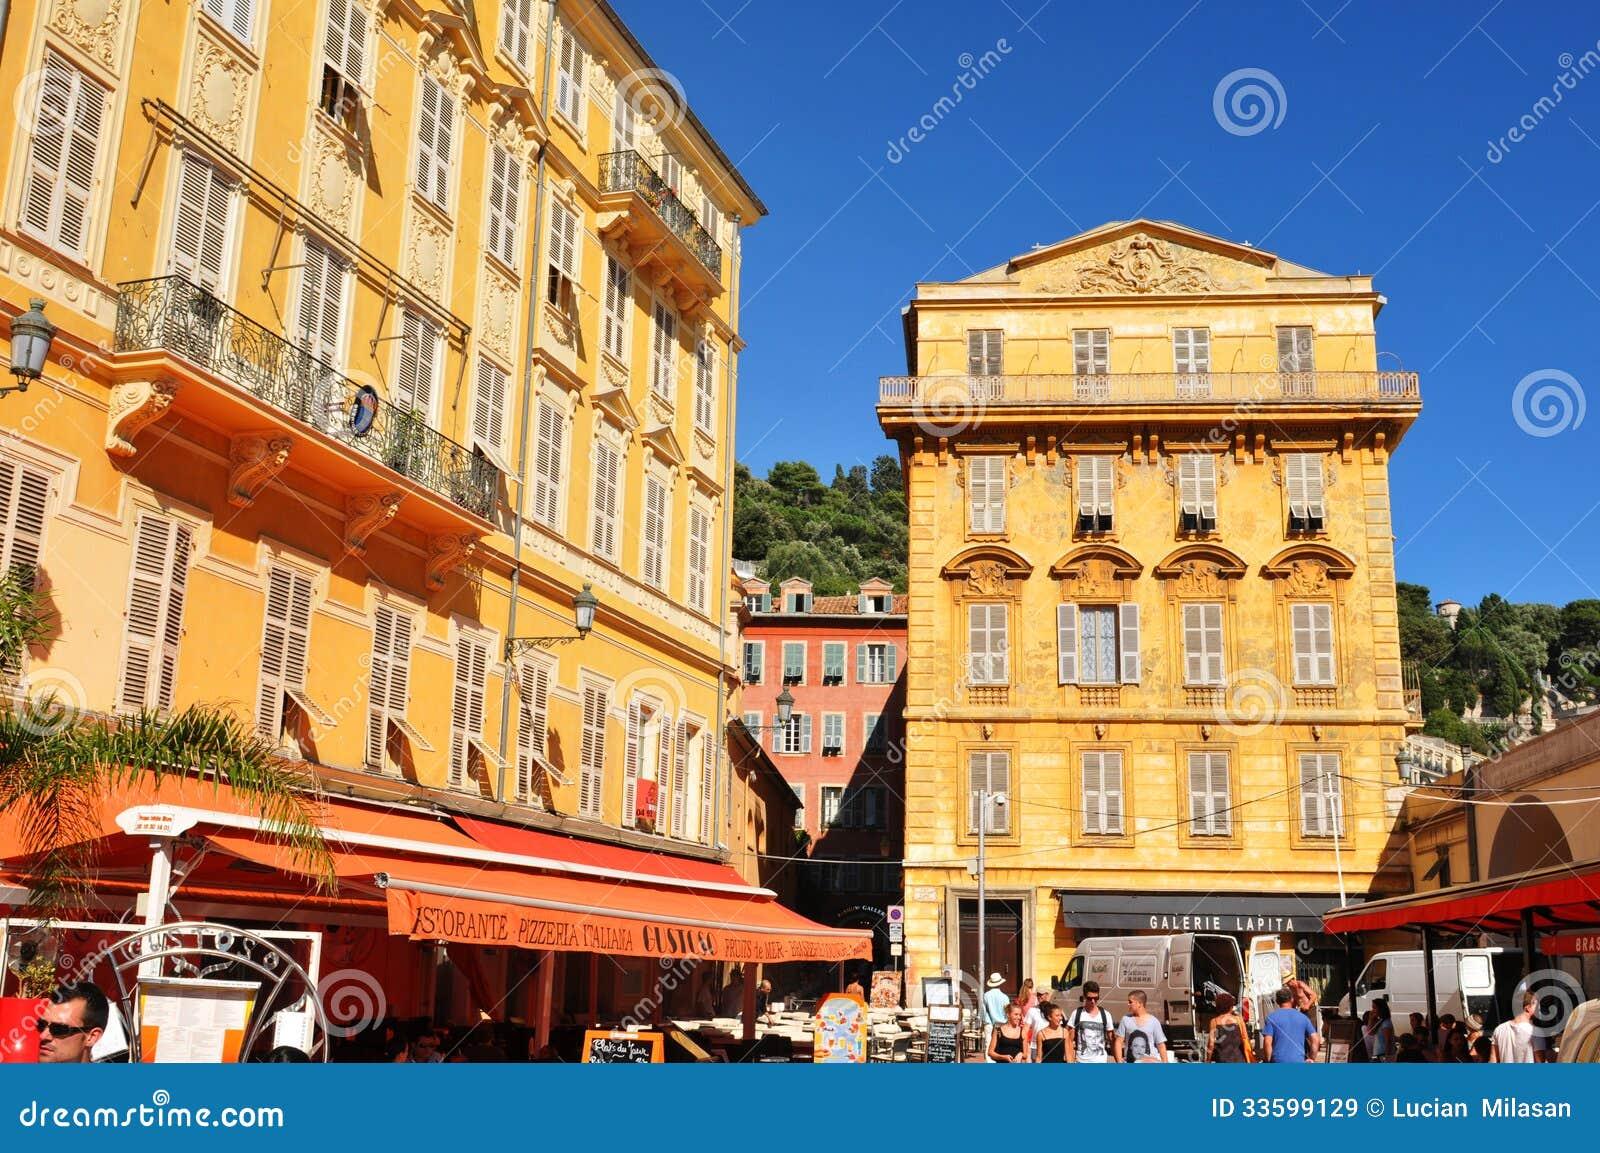 old town of nice france editorial stock image image 33599129. Black Bedroom Furniture Sets. Home Design Ideas